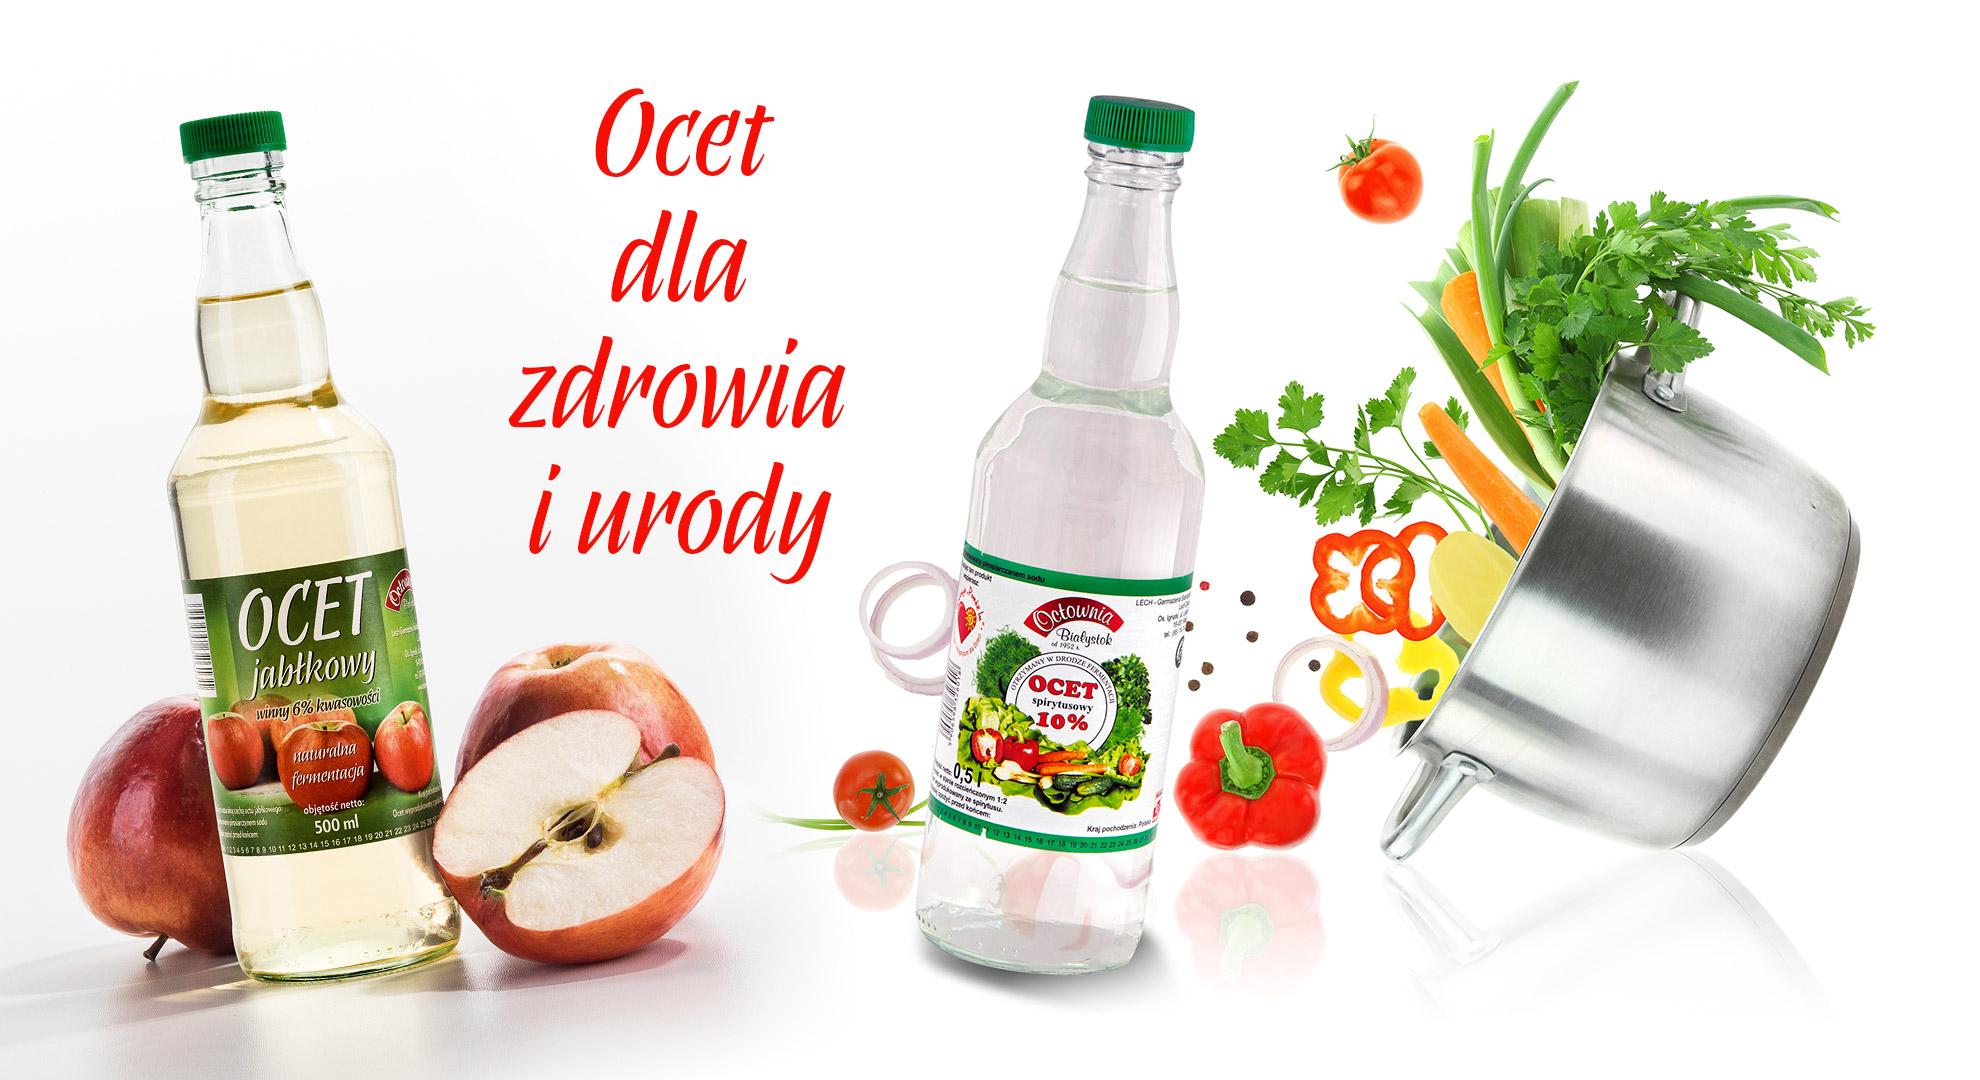 sajd_octownia_01